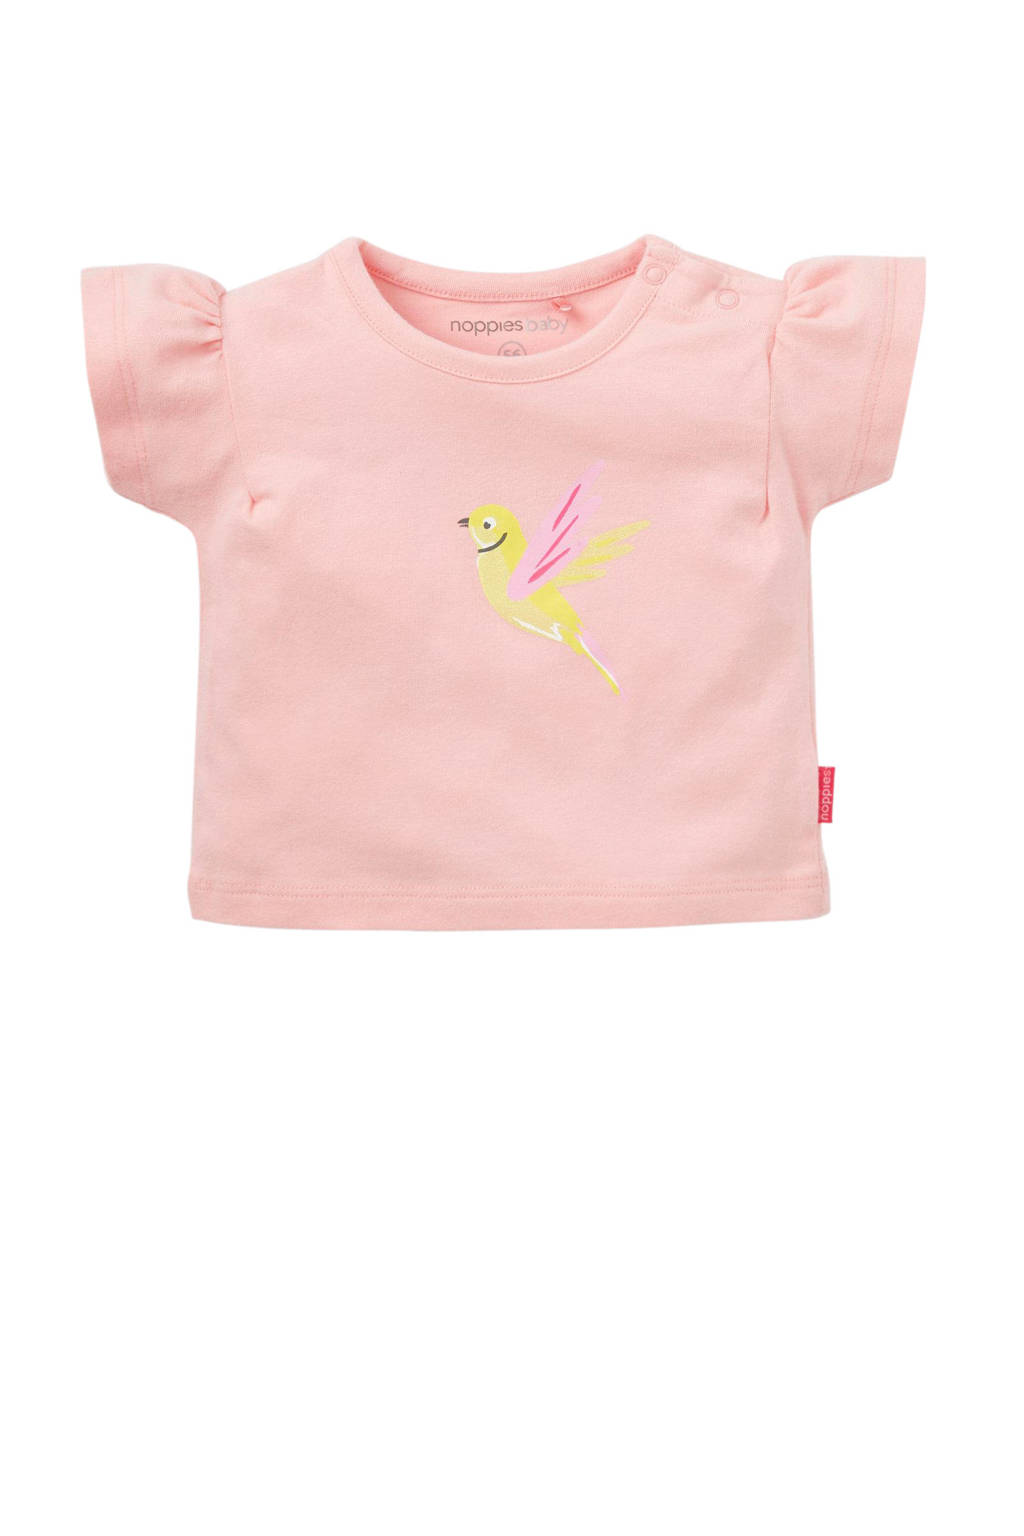 Noppies baby T-shirt Silvis lichtroze, Lichtroze